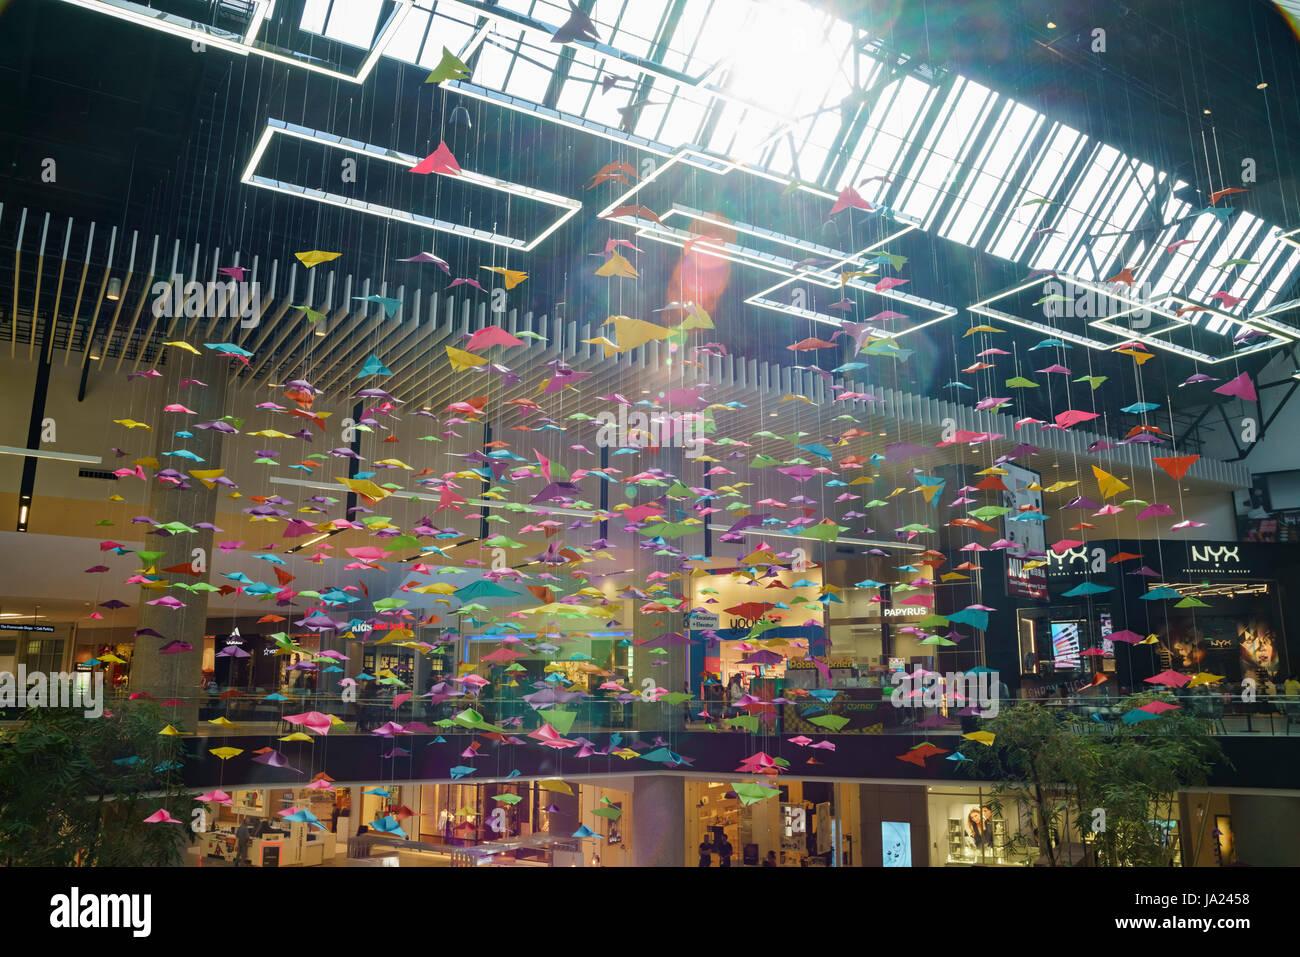 Los Angeles, APR 13: The beautiful colorful paper art of Santa Anita Mall on APR 13, 2017 at Los Angeles, California - Stock Image